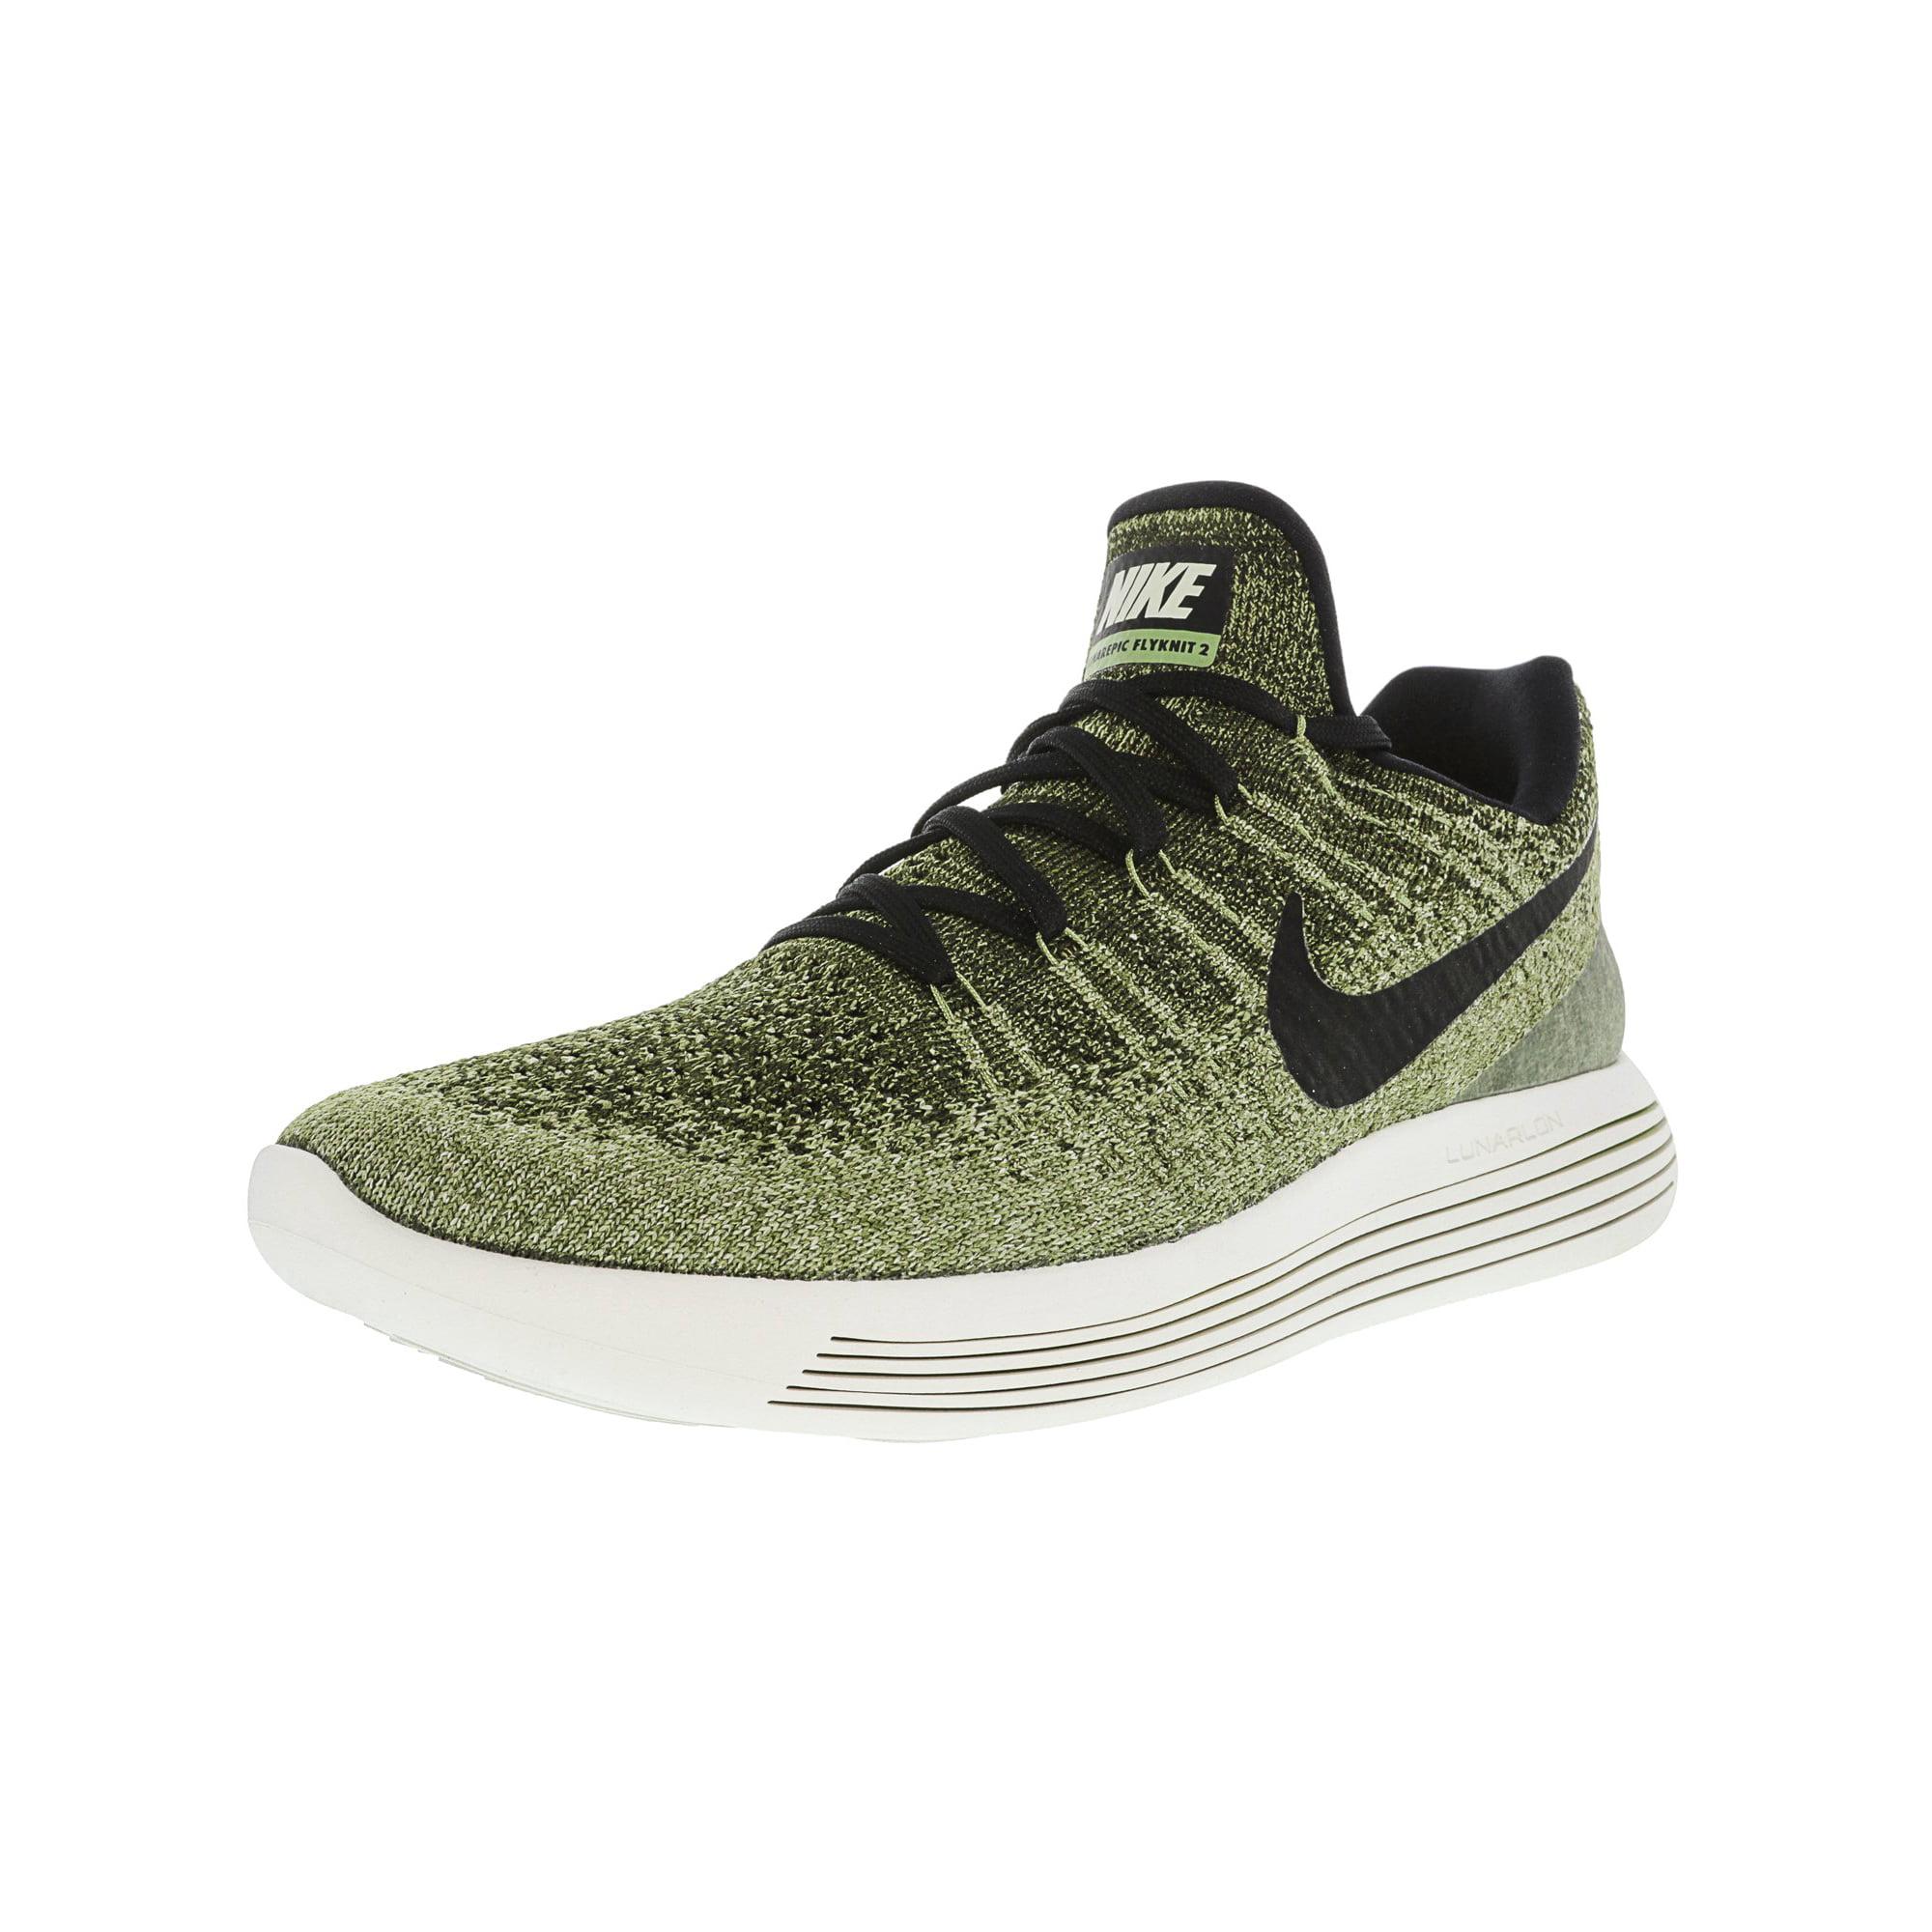 d78aa5aa02c9d Nike Men's Lunarepic Low Flyknit 2 Rough Green / Black Palm Ankle ...